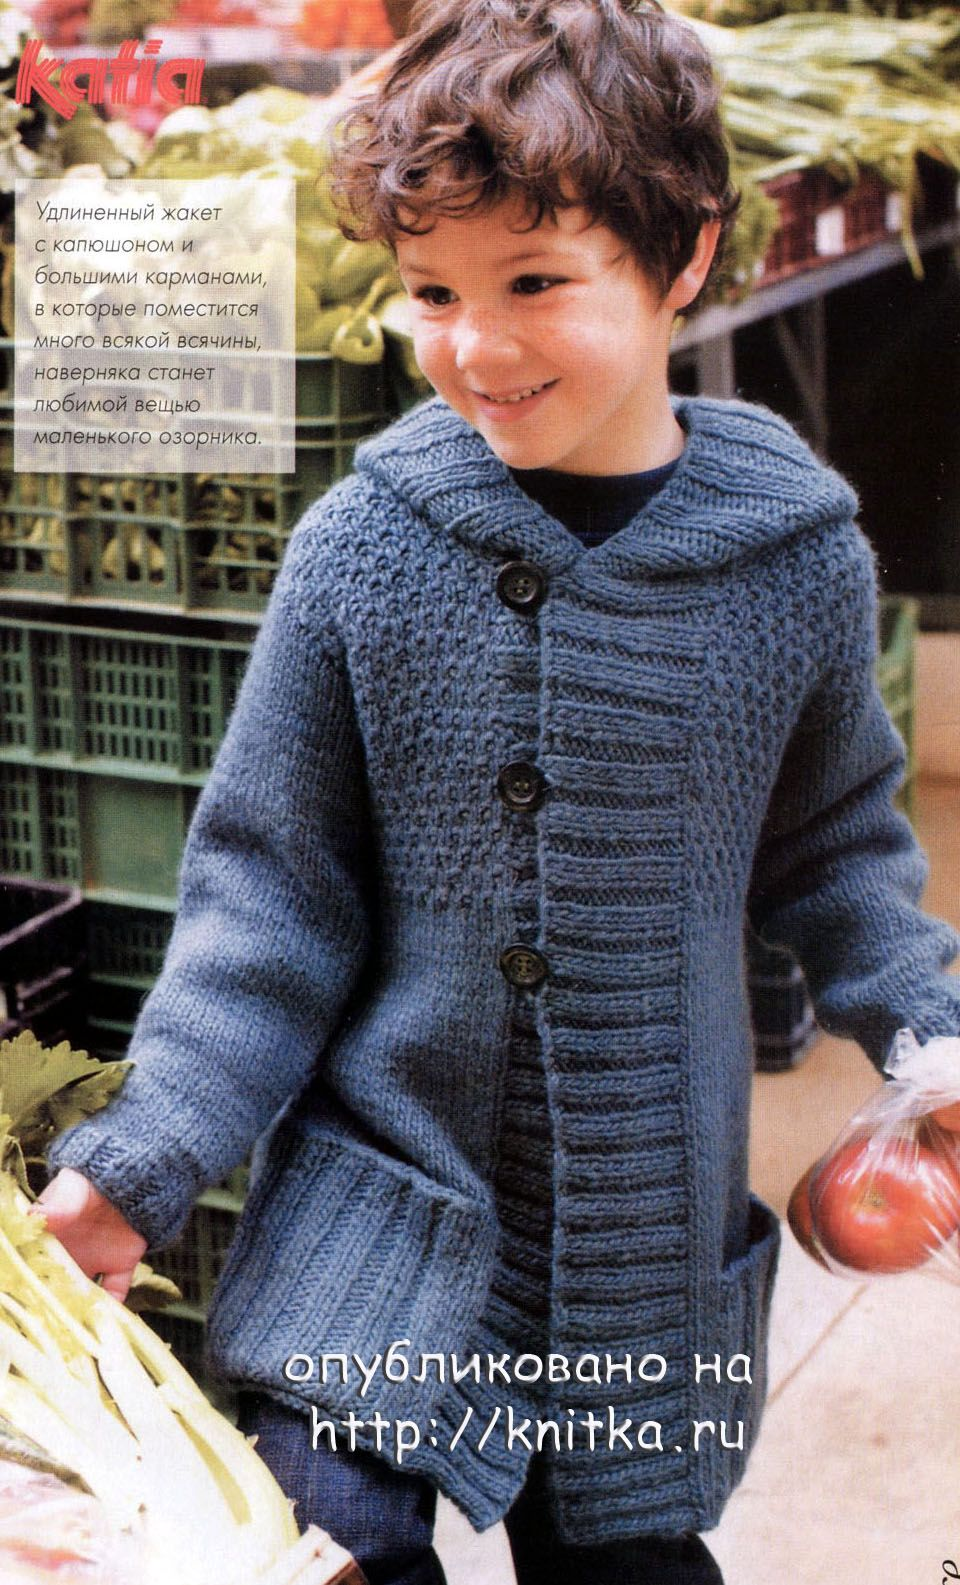 Вязание, вязание спицами, вязание